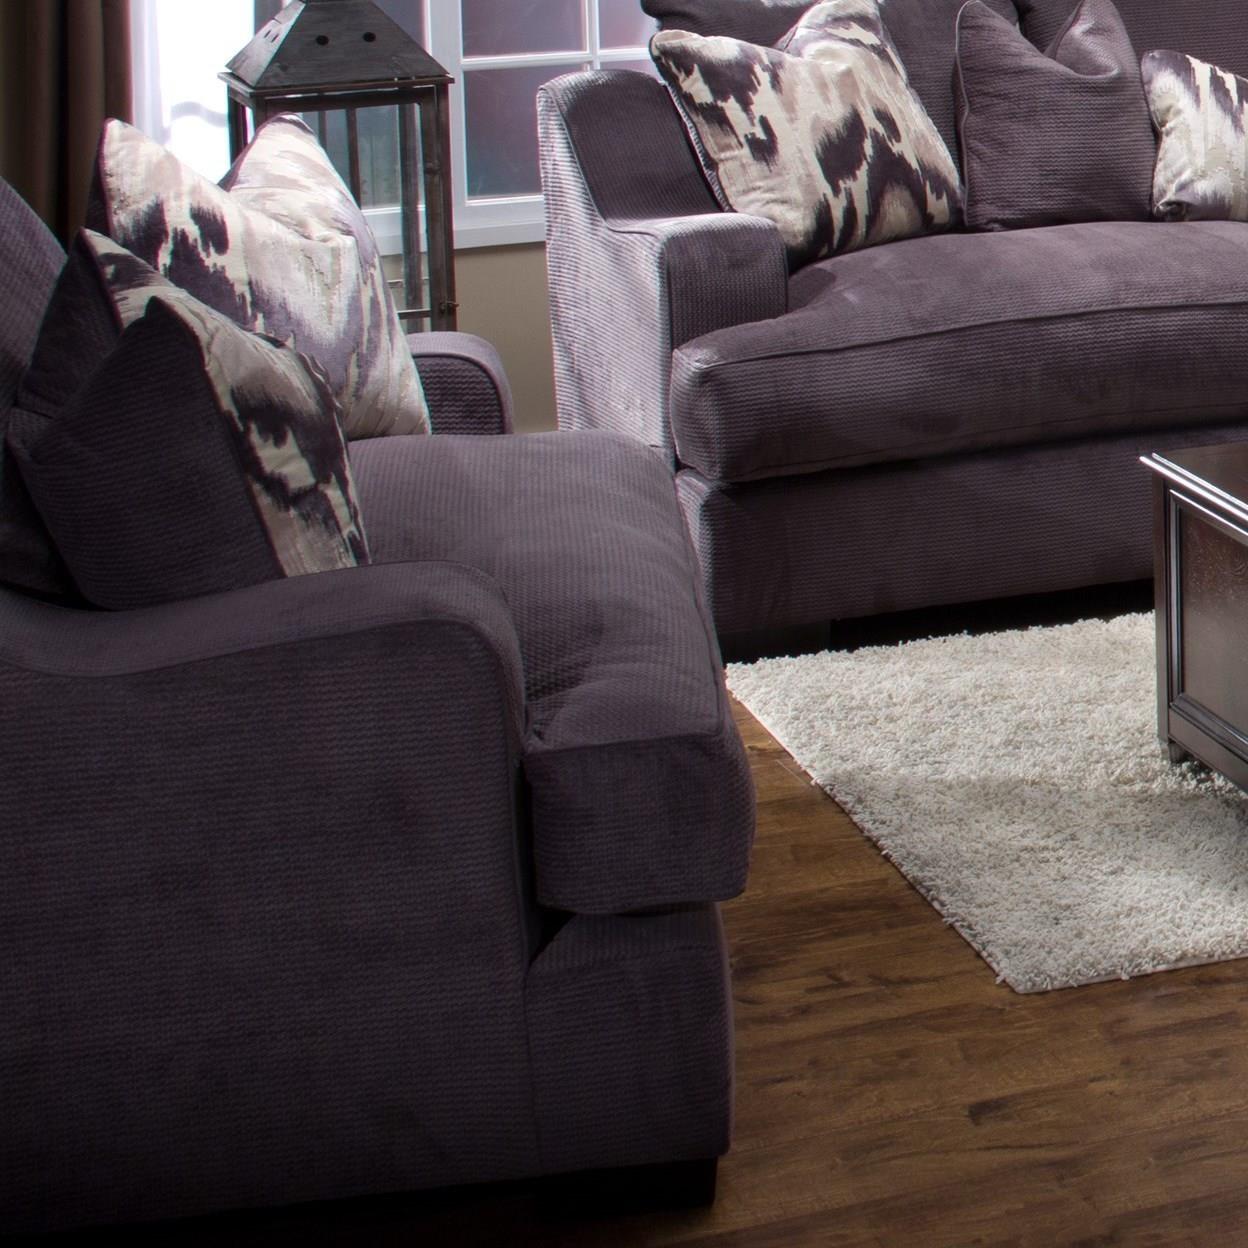 michael nicholas aspen sofa almayo sofas spartan spacha chair pilgrim furniture